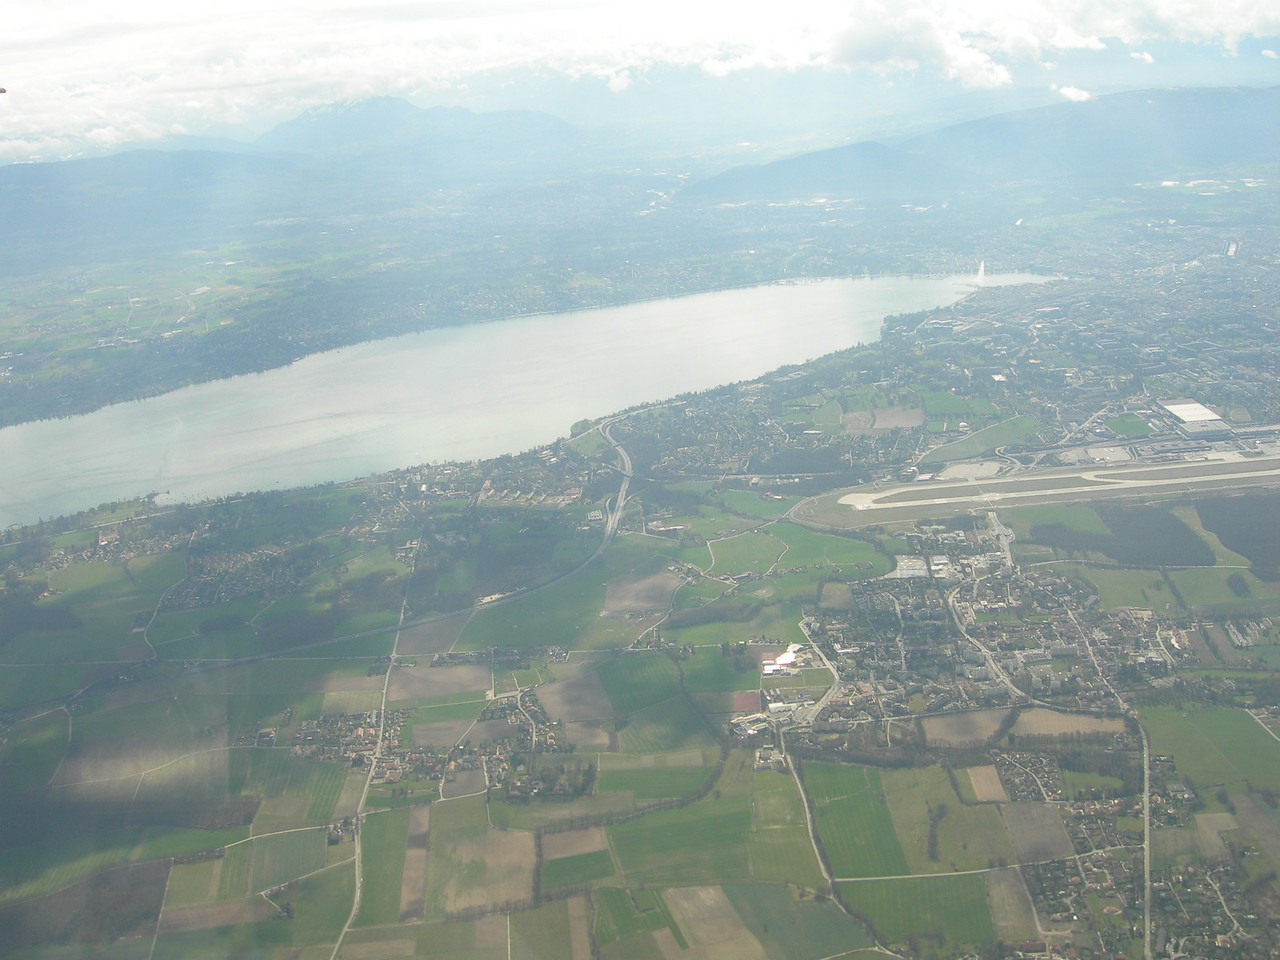 Lac Leman (Lake Geneva).  Jet D'eau (Fountain) at the far end (right) of the lake.